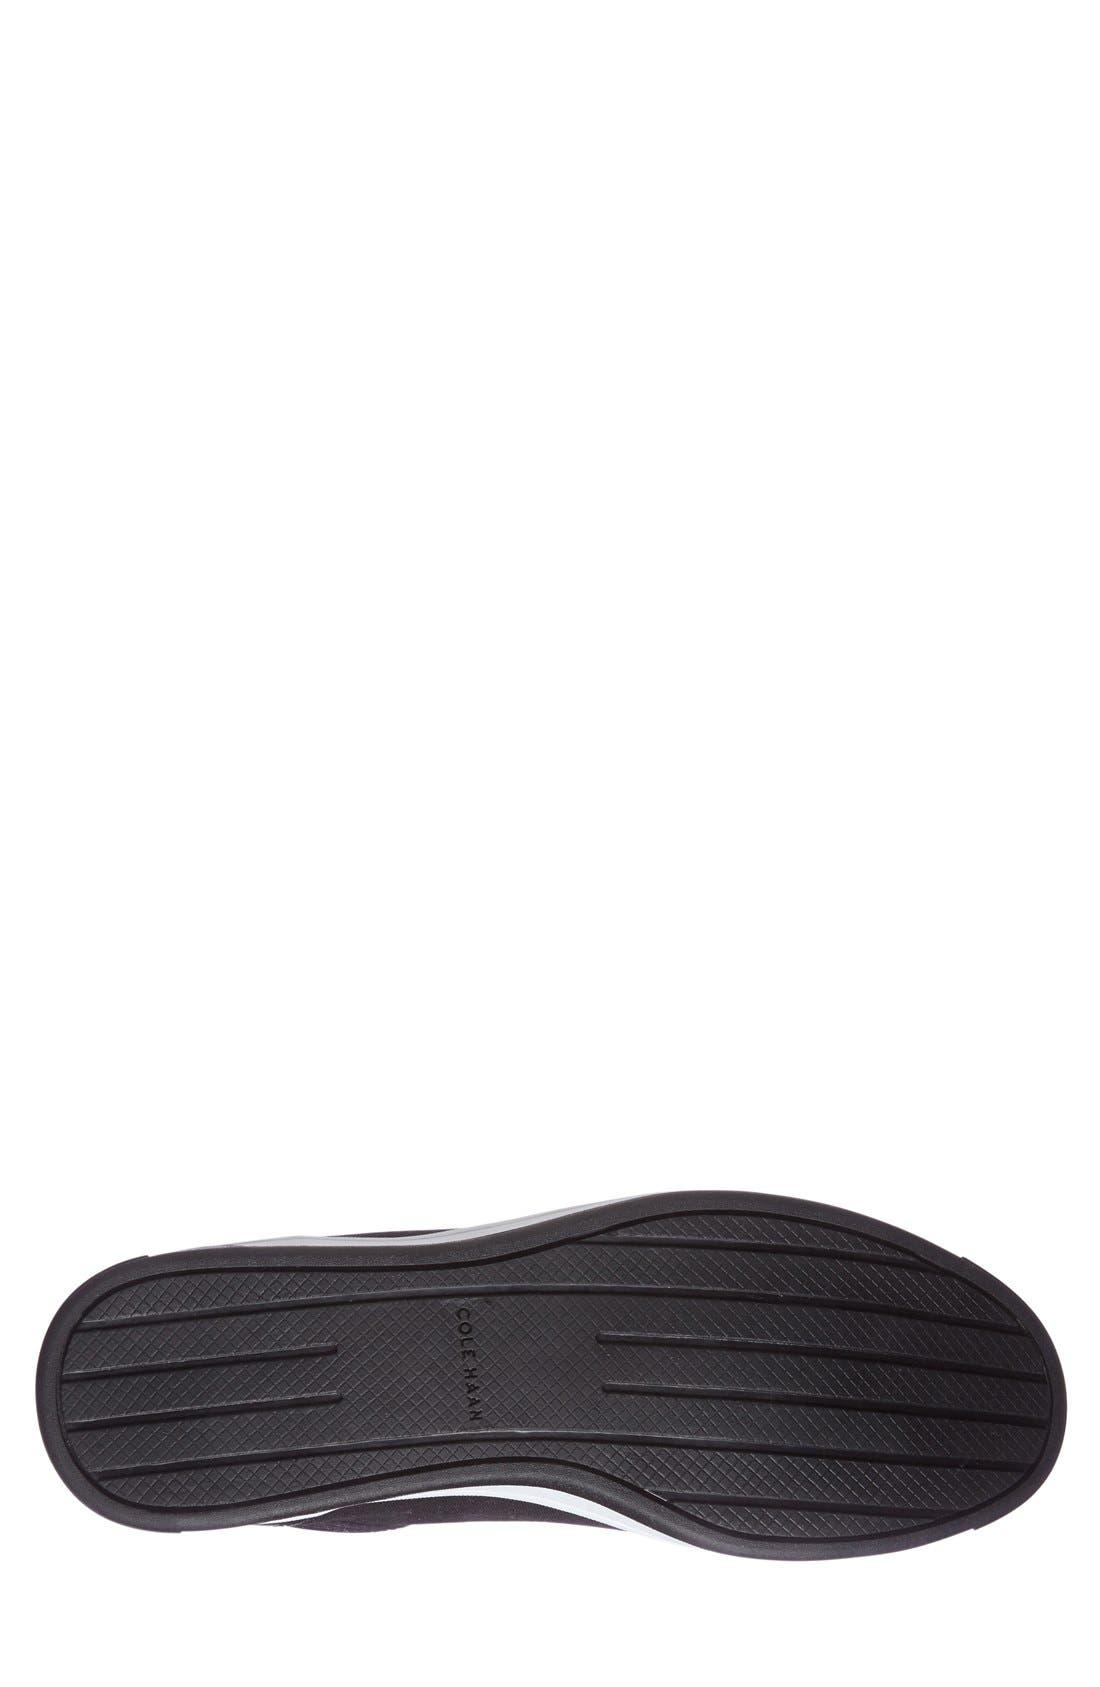 'Vartan Sport Oxford' Sneaker,                             Alternate thumbnail 46, color,